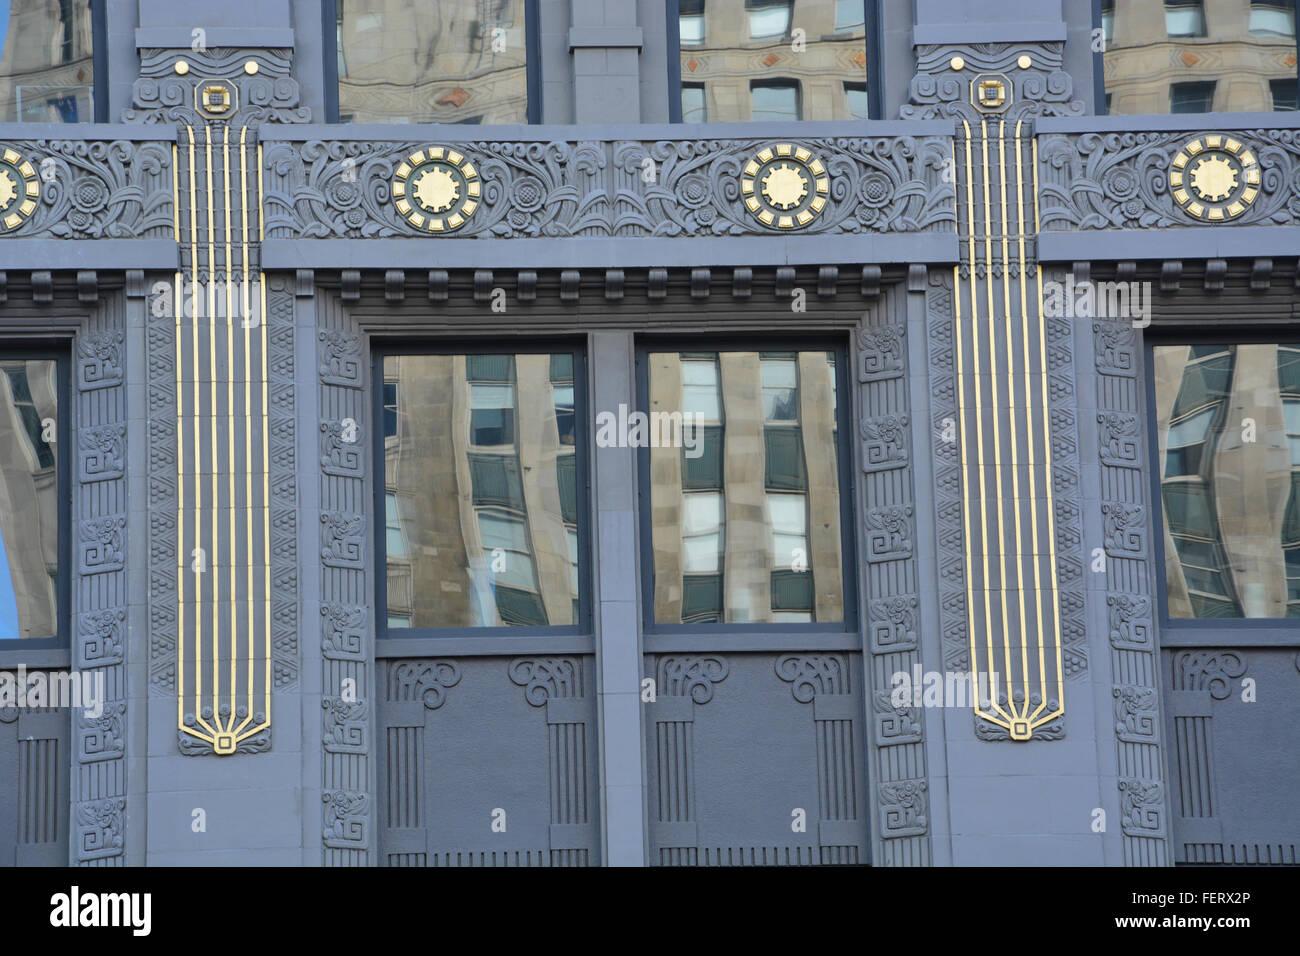 Art Deco terracotta building facade along Wacker Drive in Chicago Illinois. - Stock Image